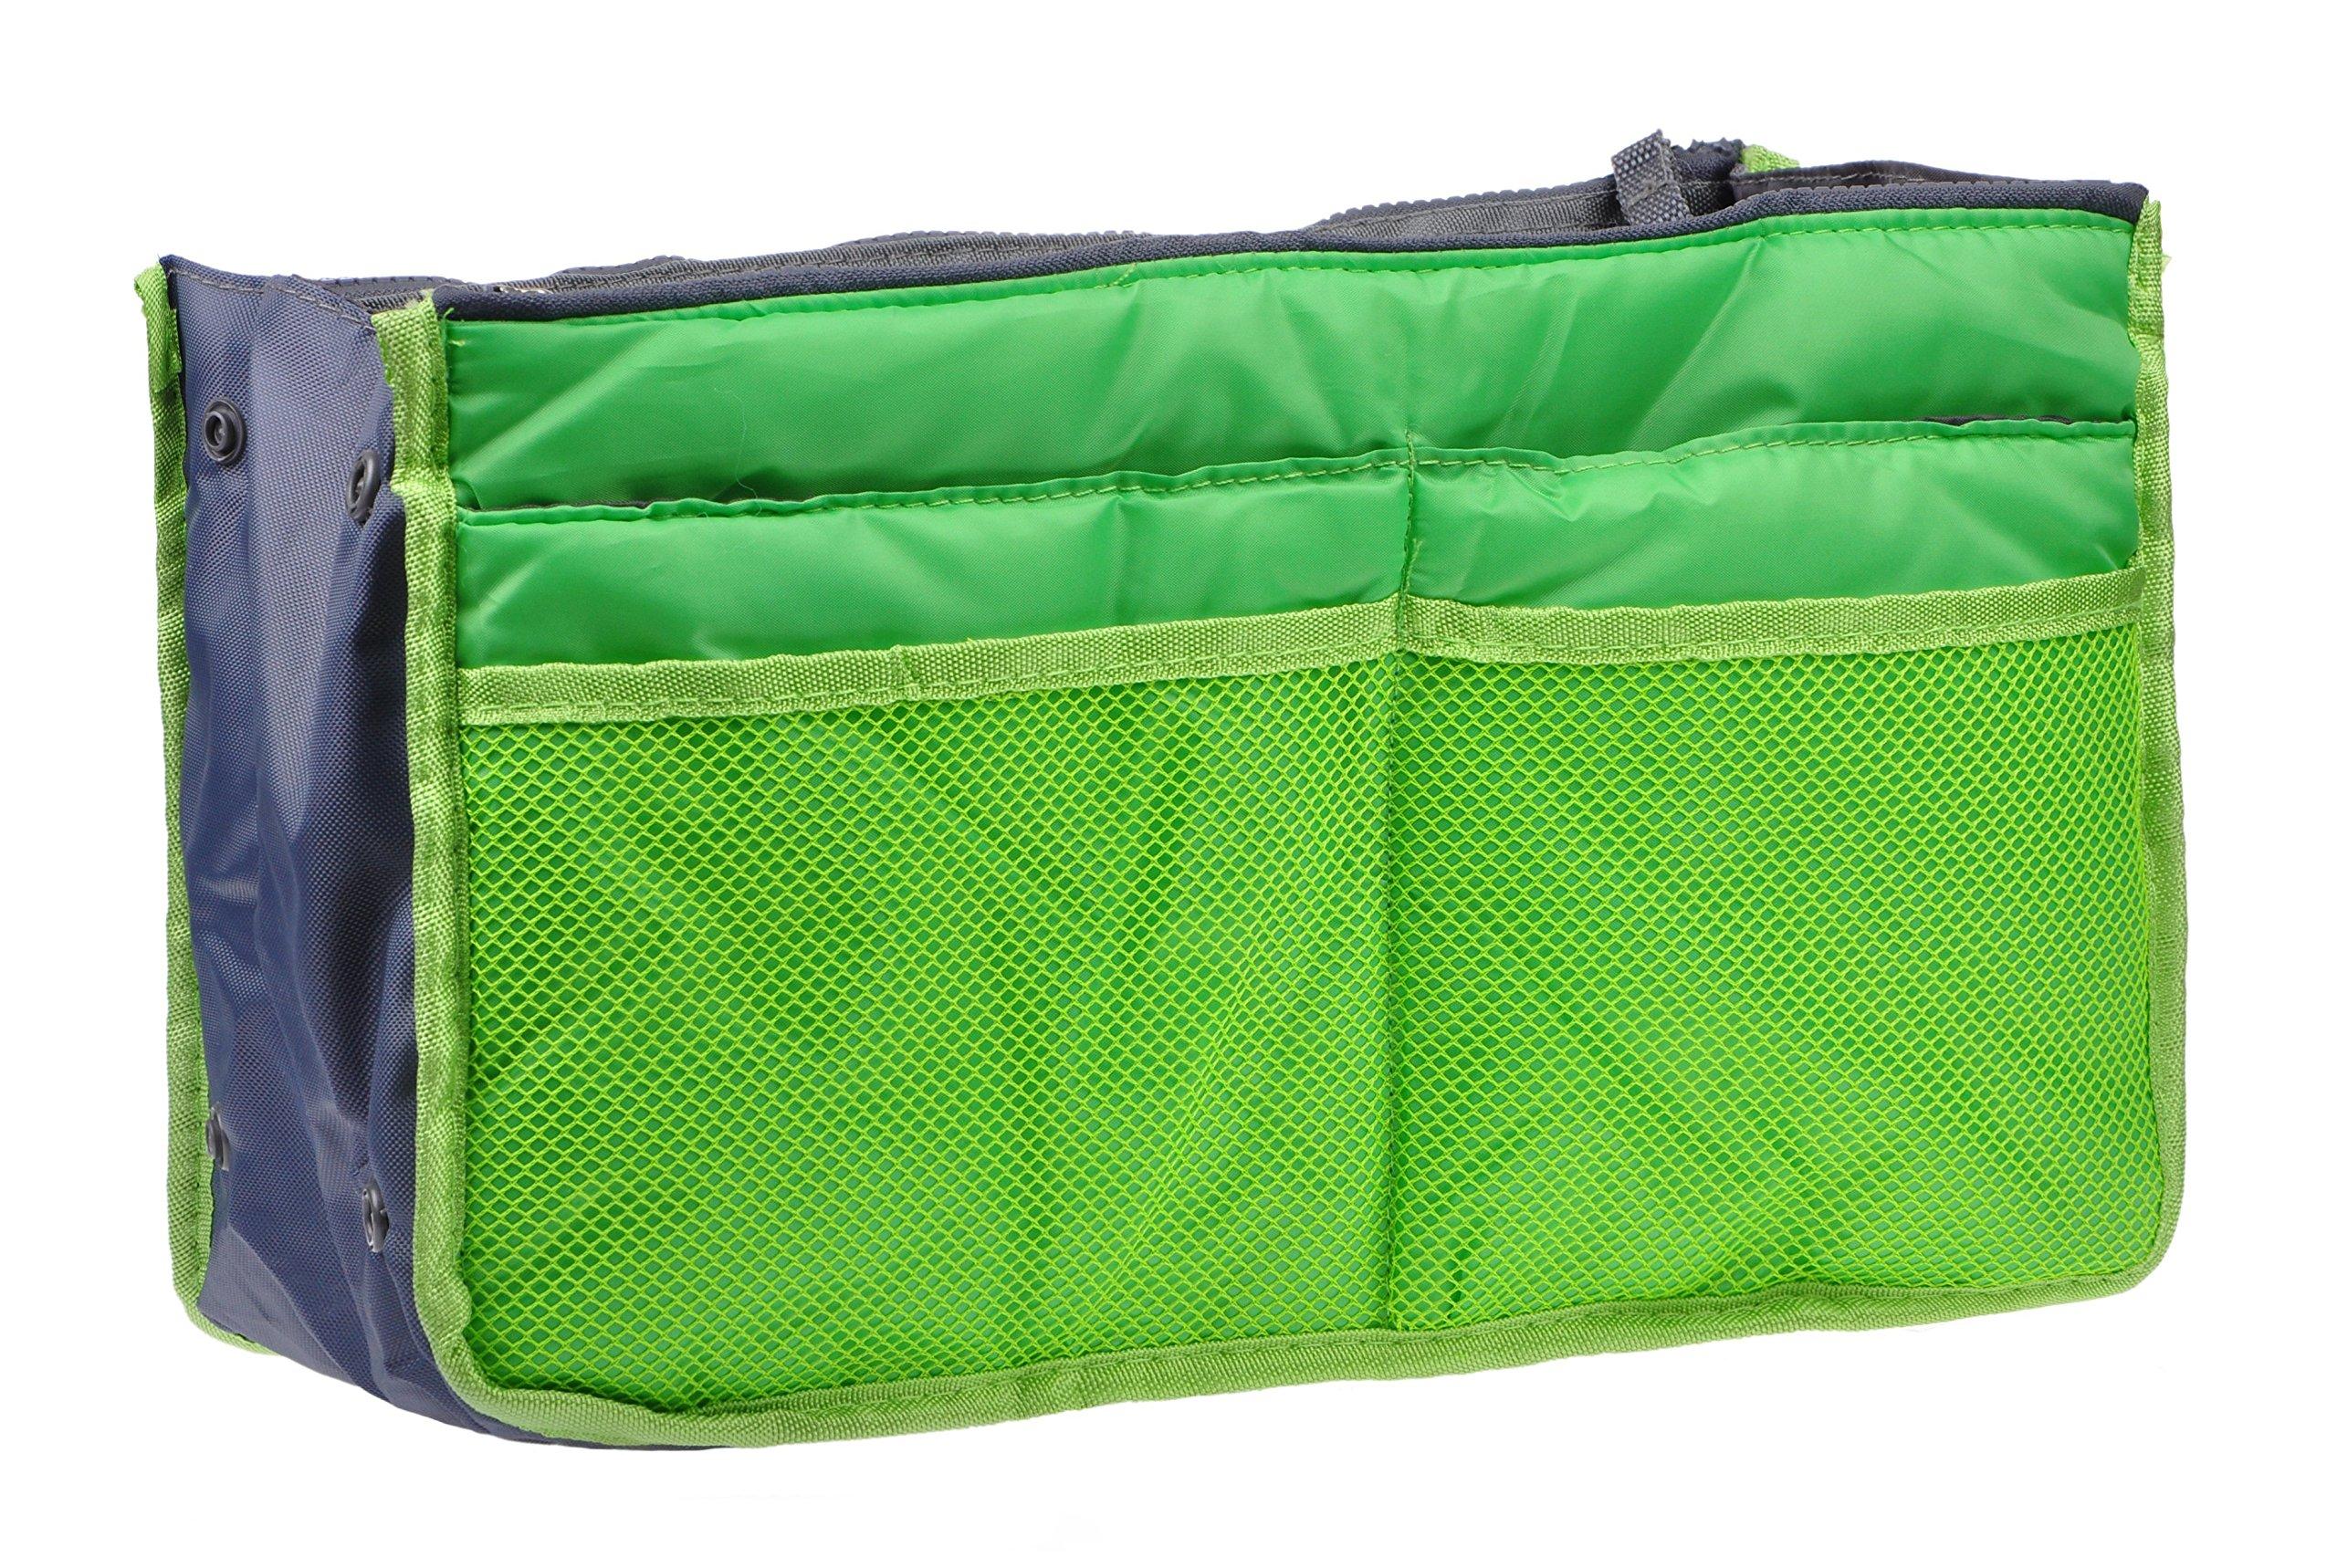 Insert Handbag Purse Travel Organizer Bag Multi-pocket Tidy Bags For Multipurpose (green)